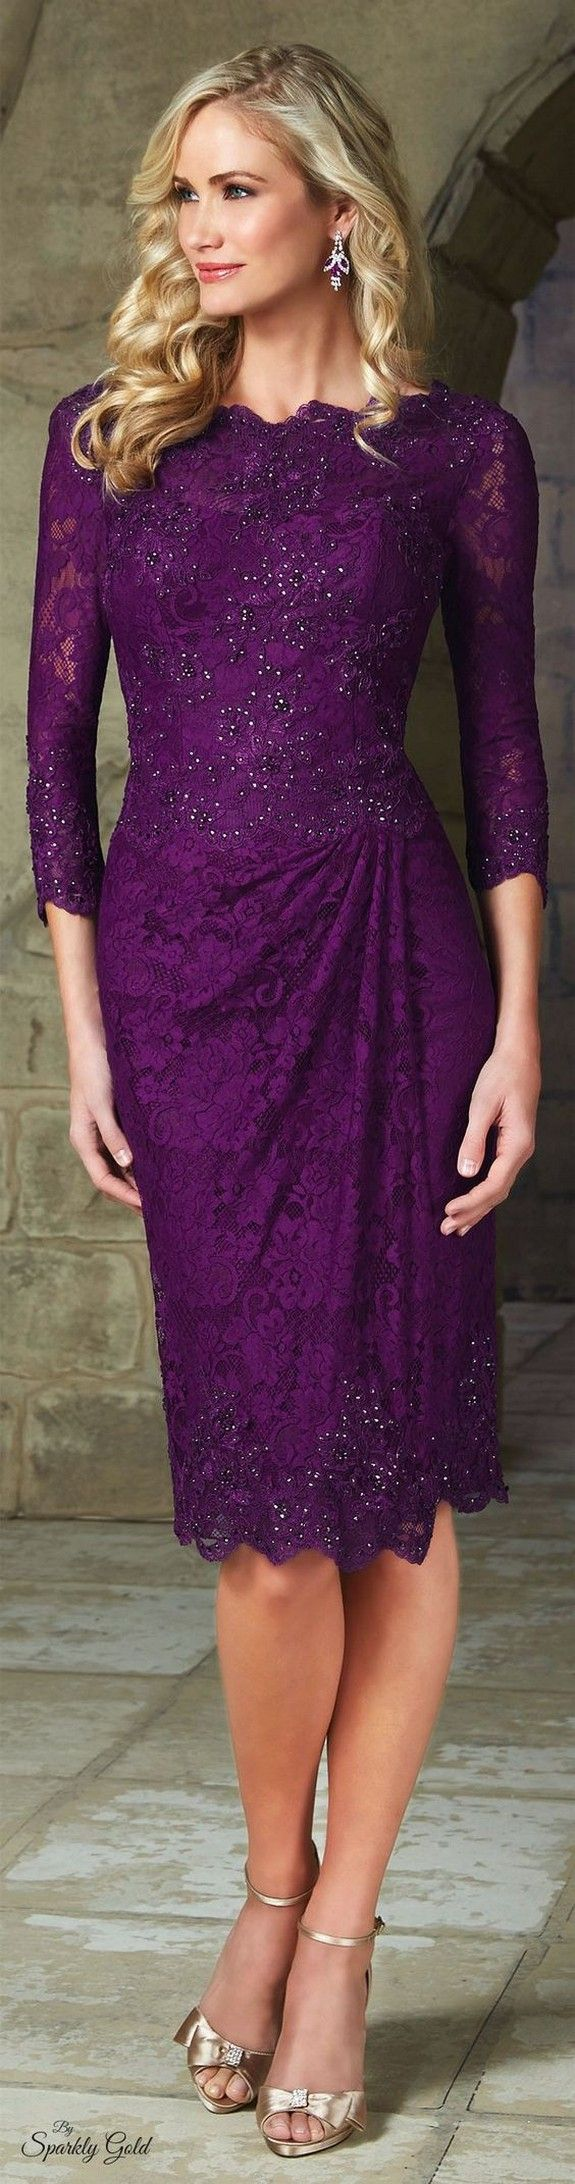 Mejores 641 imágenes de Event Dresses en Pinterest | Vestidos de ...